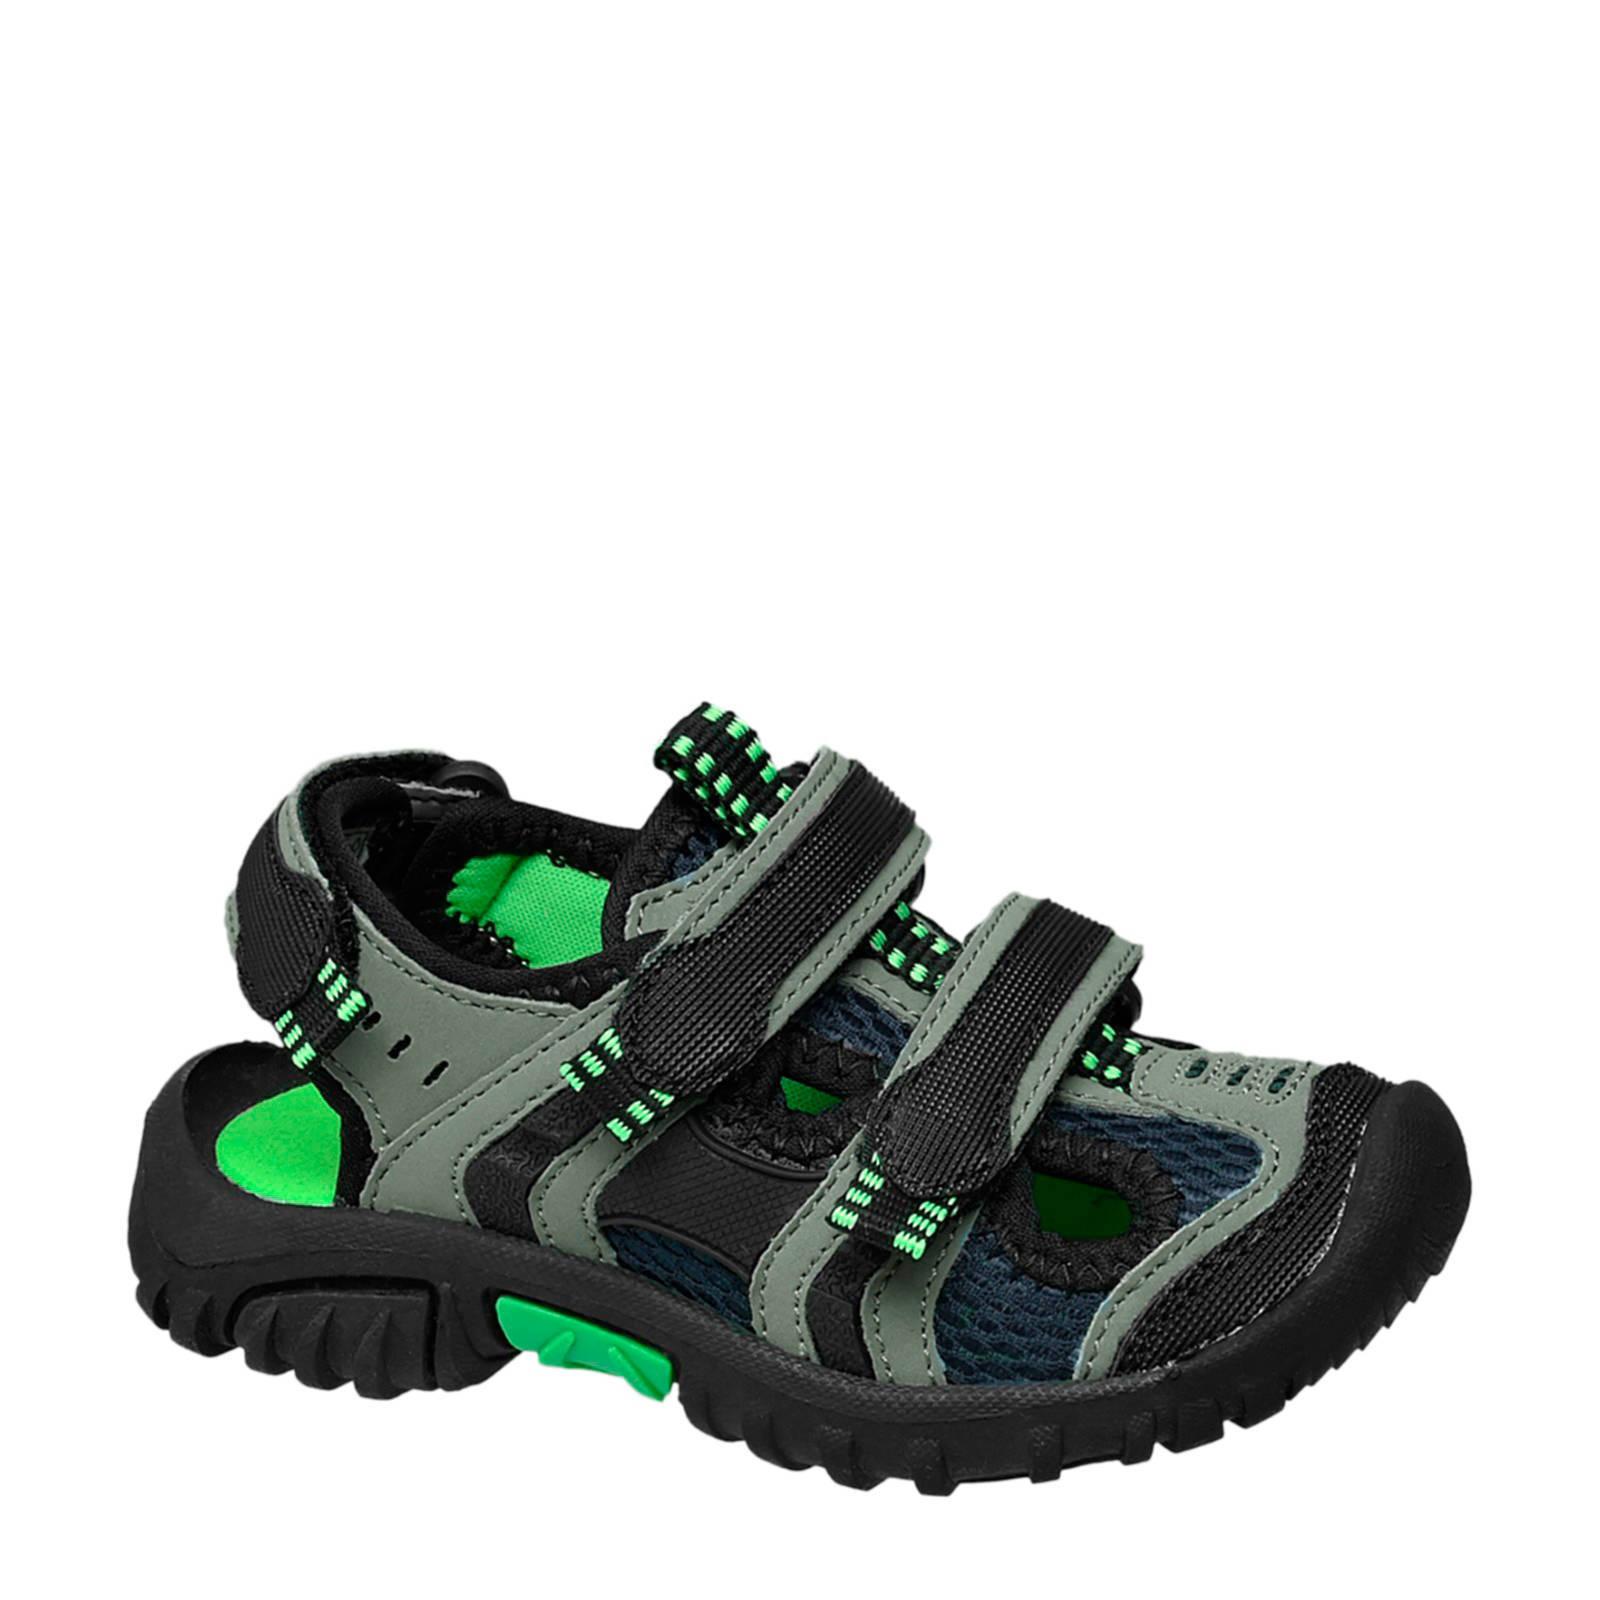 Bobbi-Shoes sandalen zwart/grijs | wehkamp